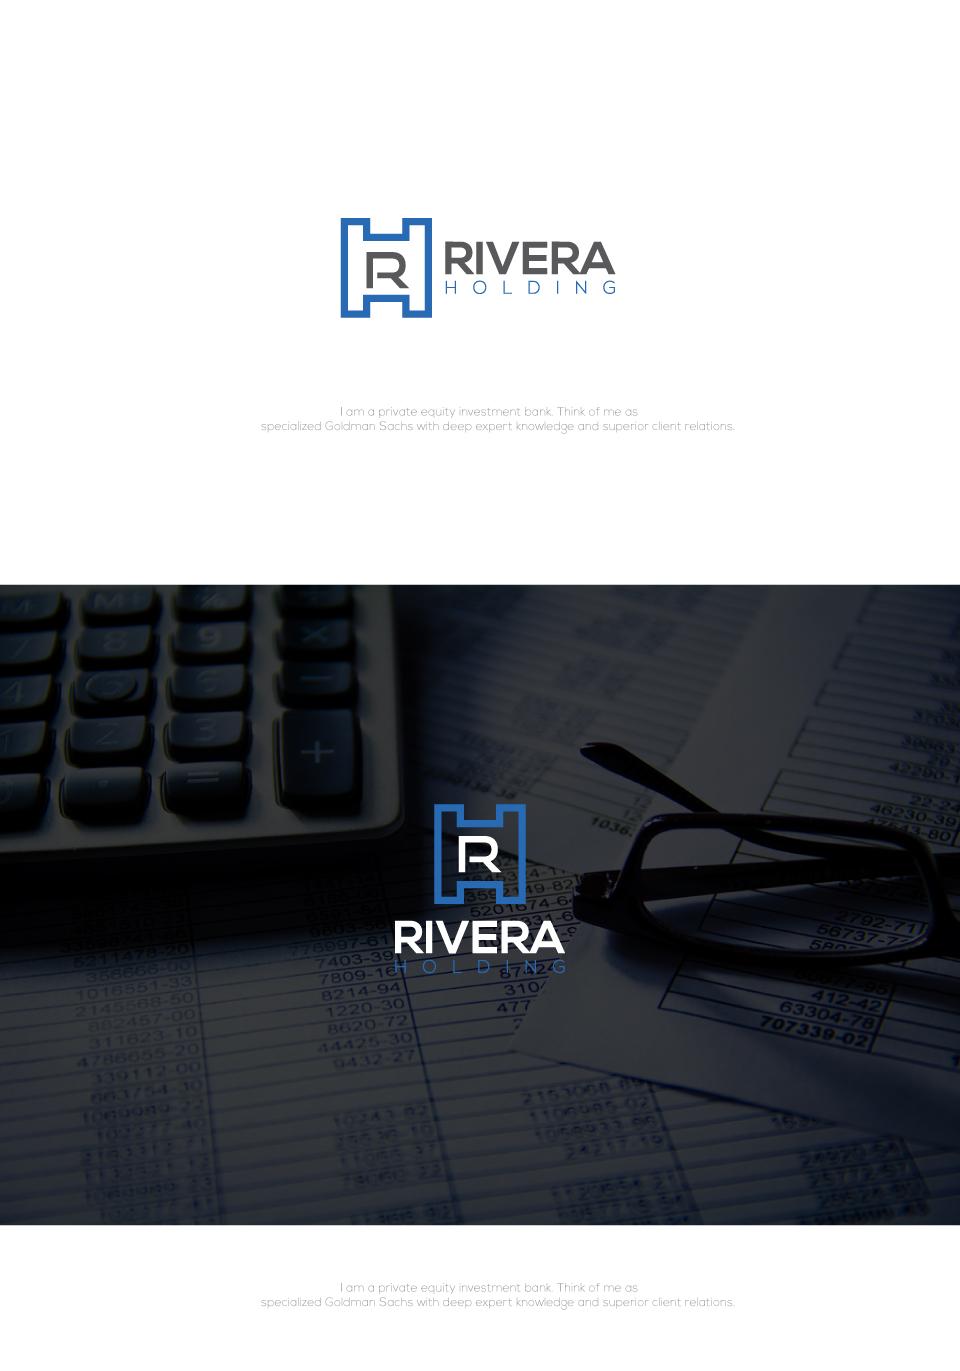 Logo Design by Md Sohal - Entry No. 129 in the Logo Design Contest RIVERA HOLDING Logo Design.